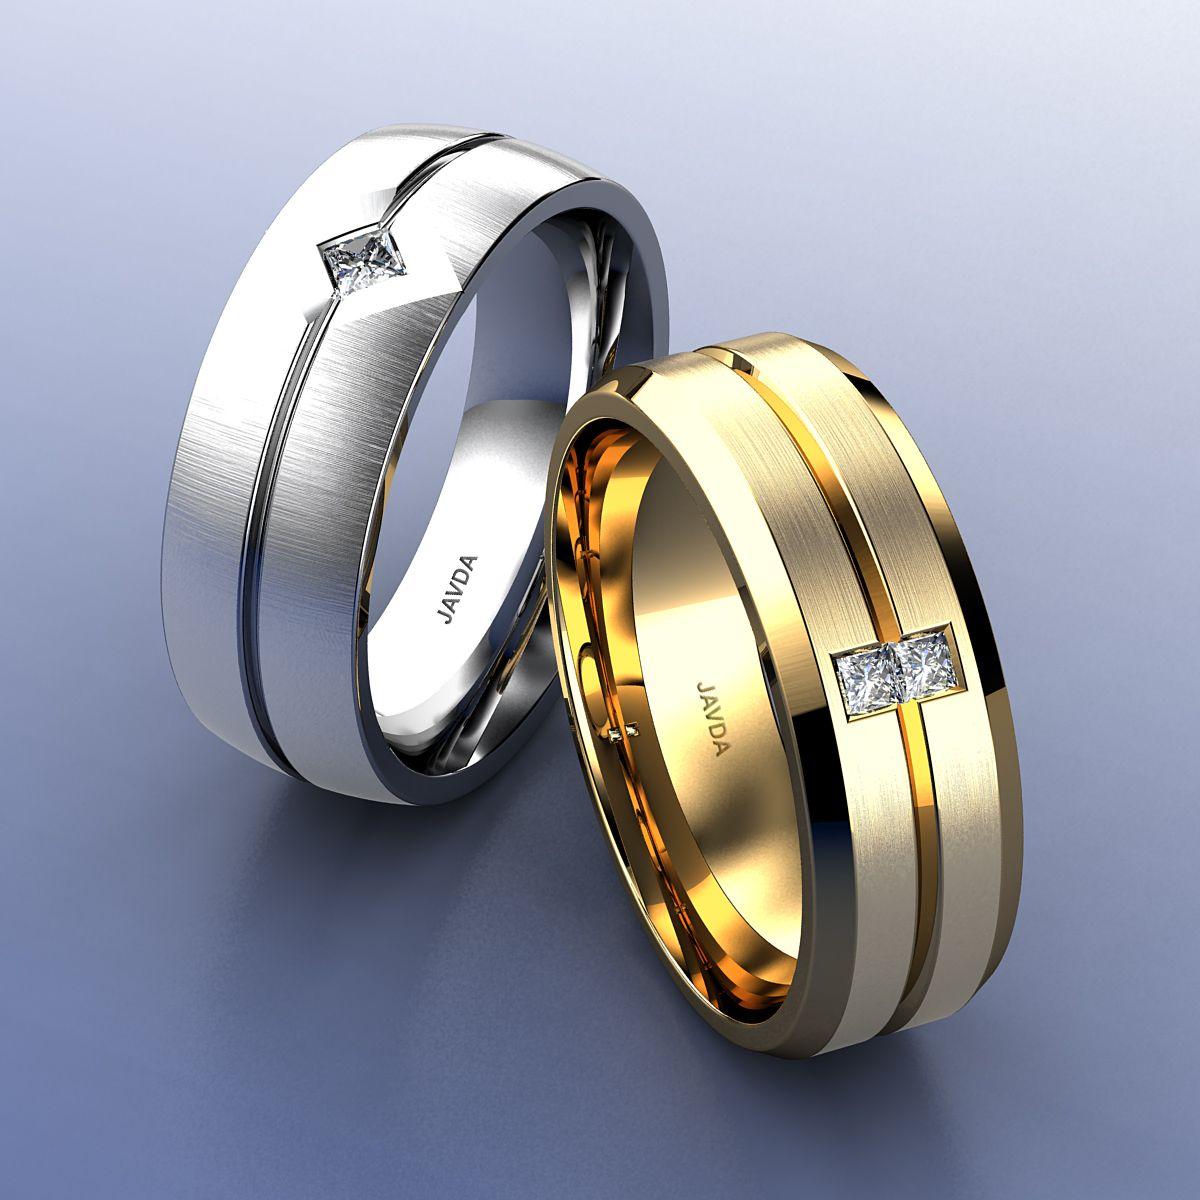 Beautiful diamond mens half wedding band crafted in 14k